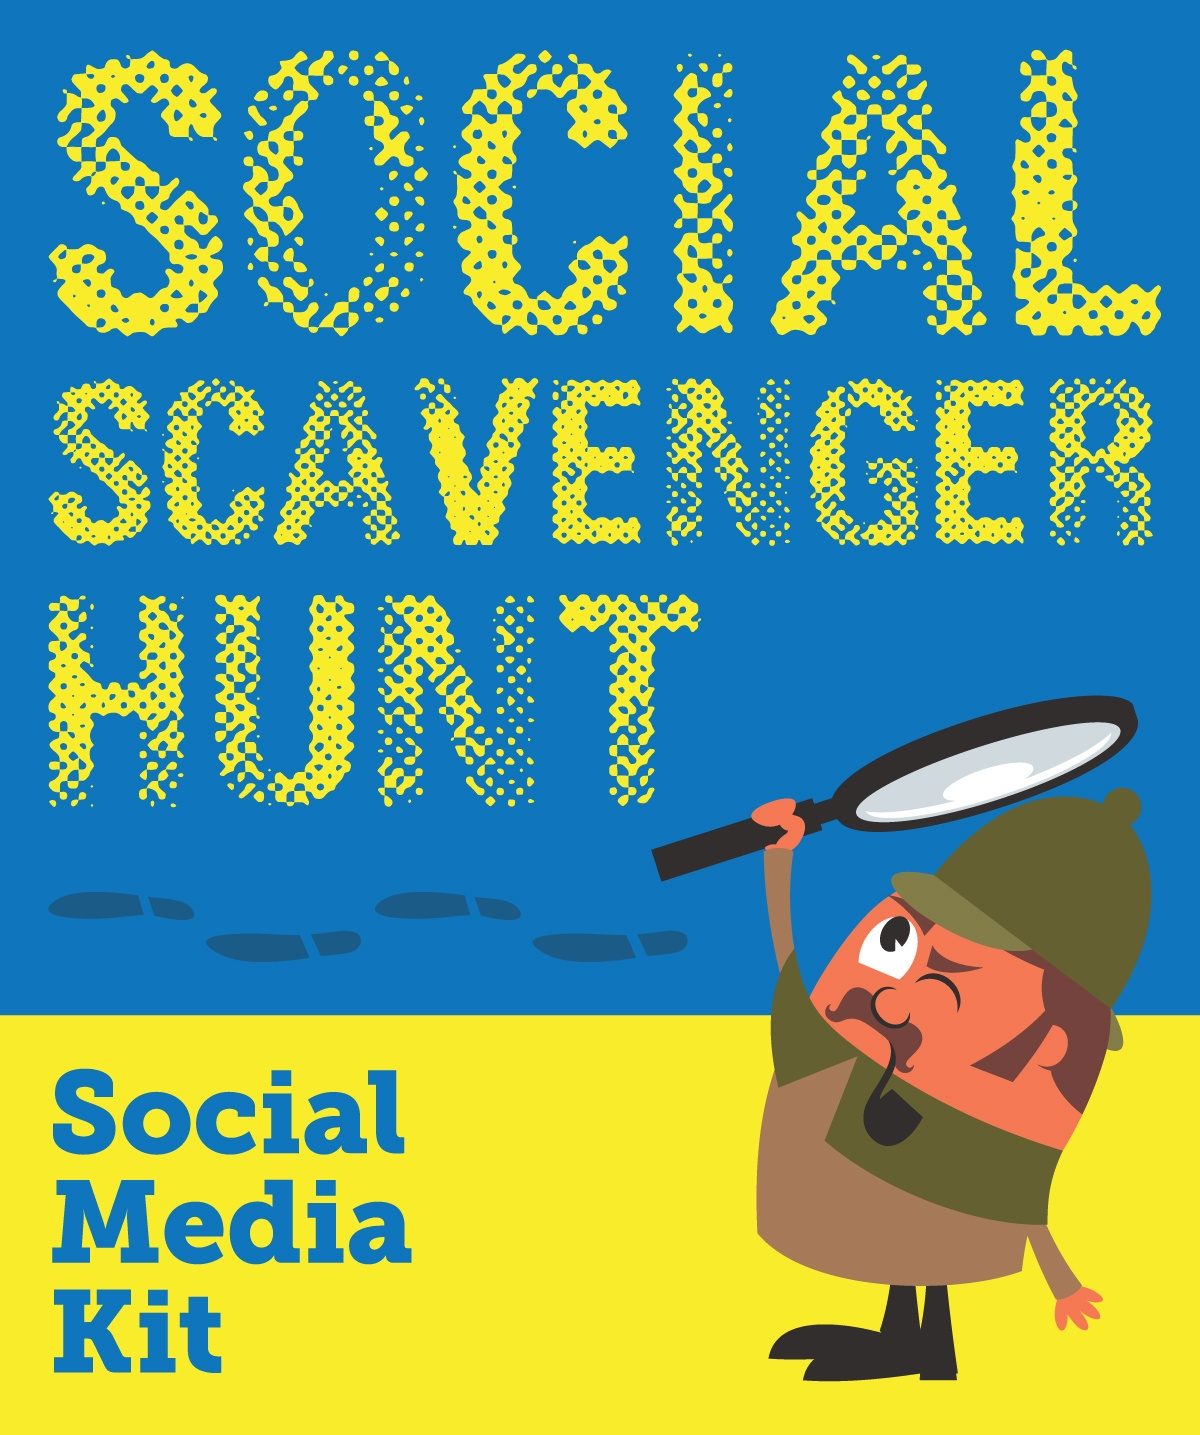 Download: social kit